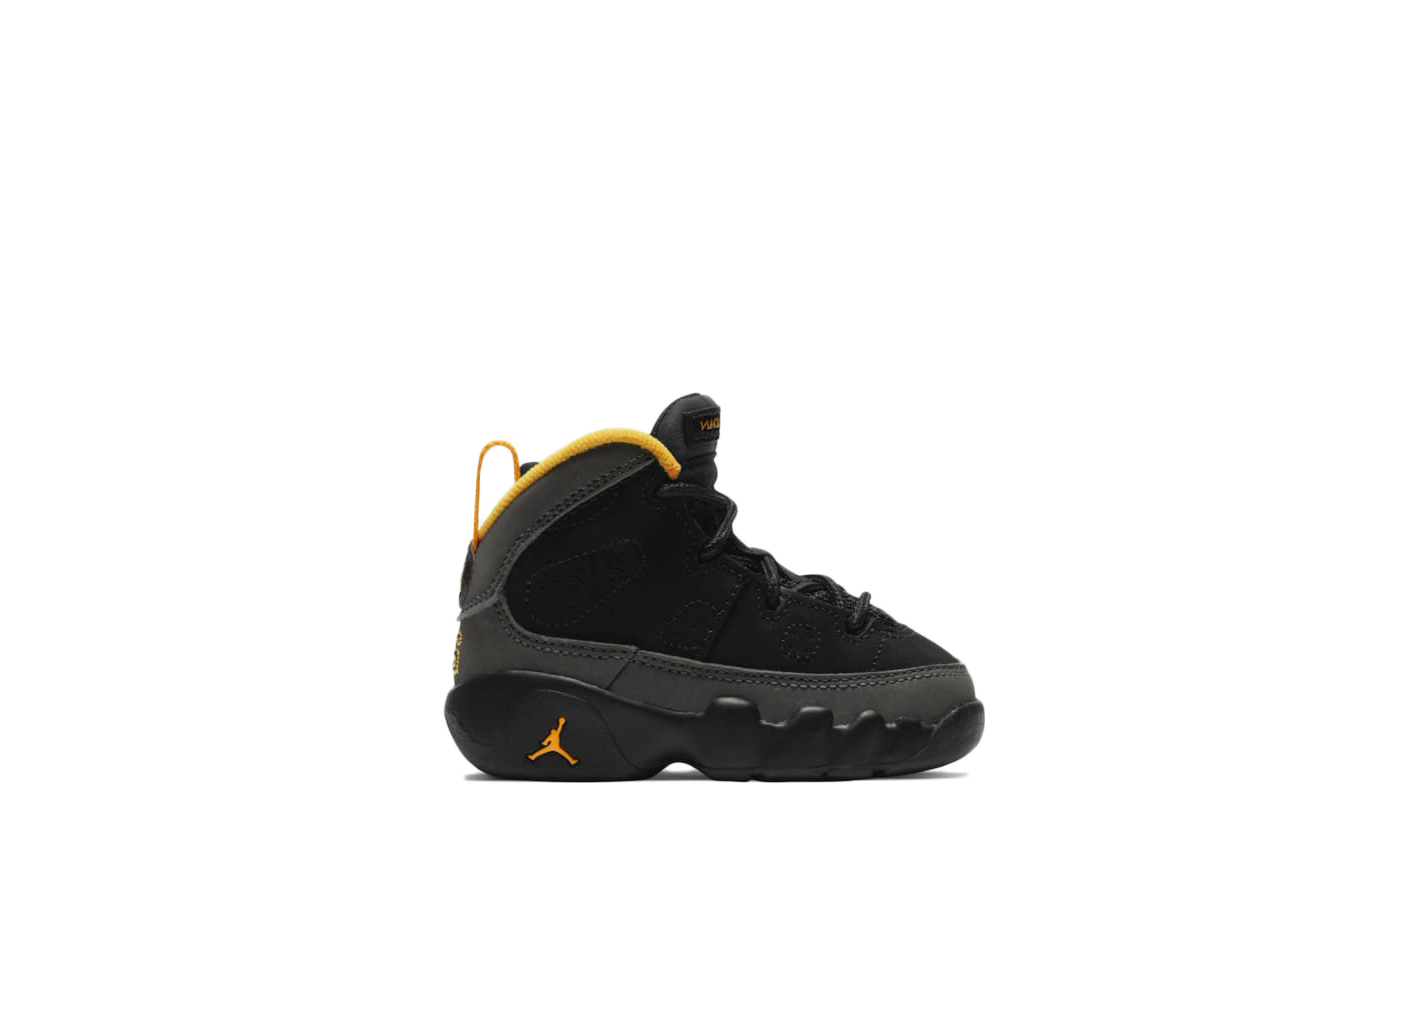 Jordan 9 Retro Dark Charcoal University Gold (TD)